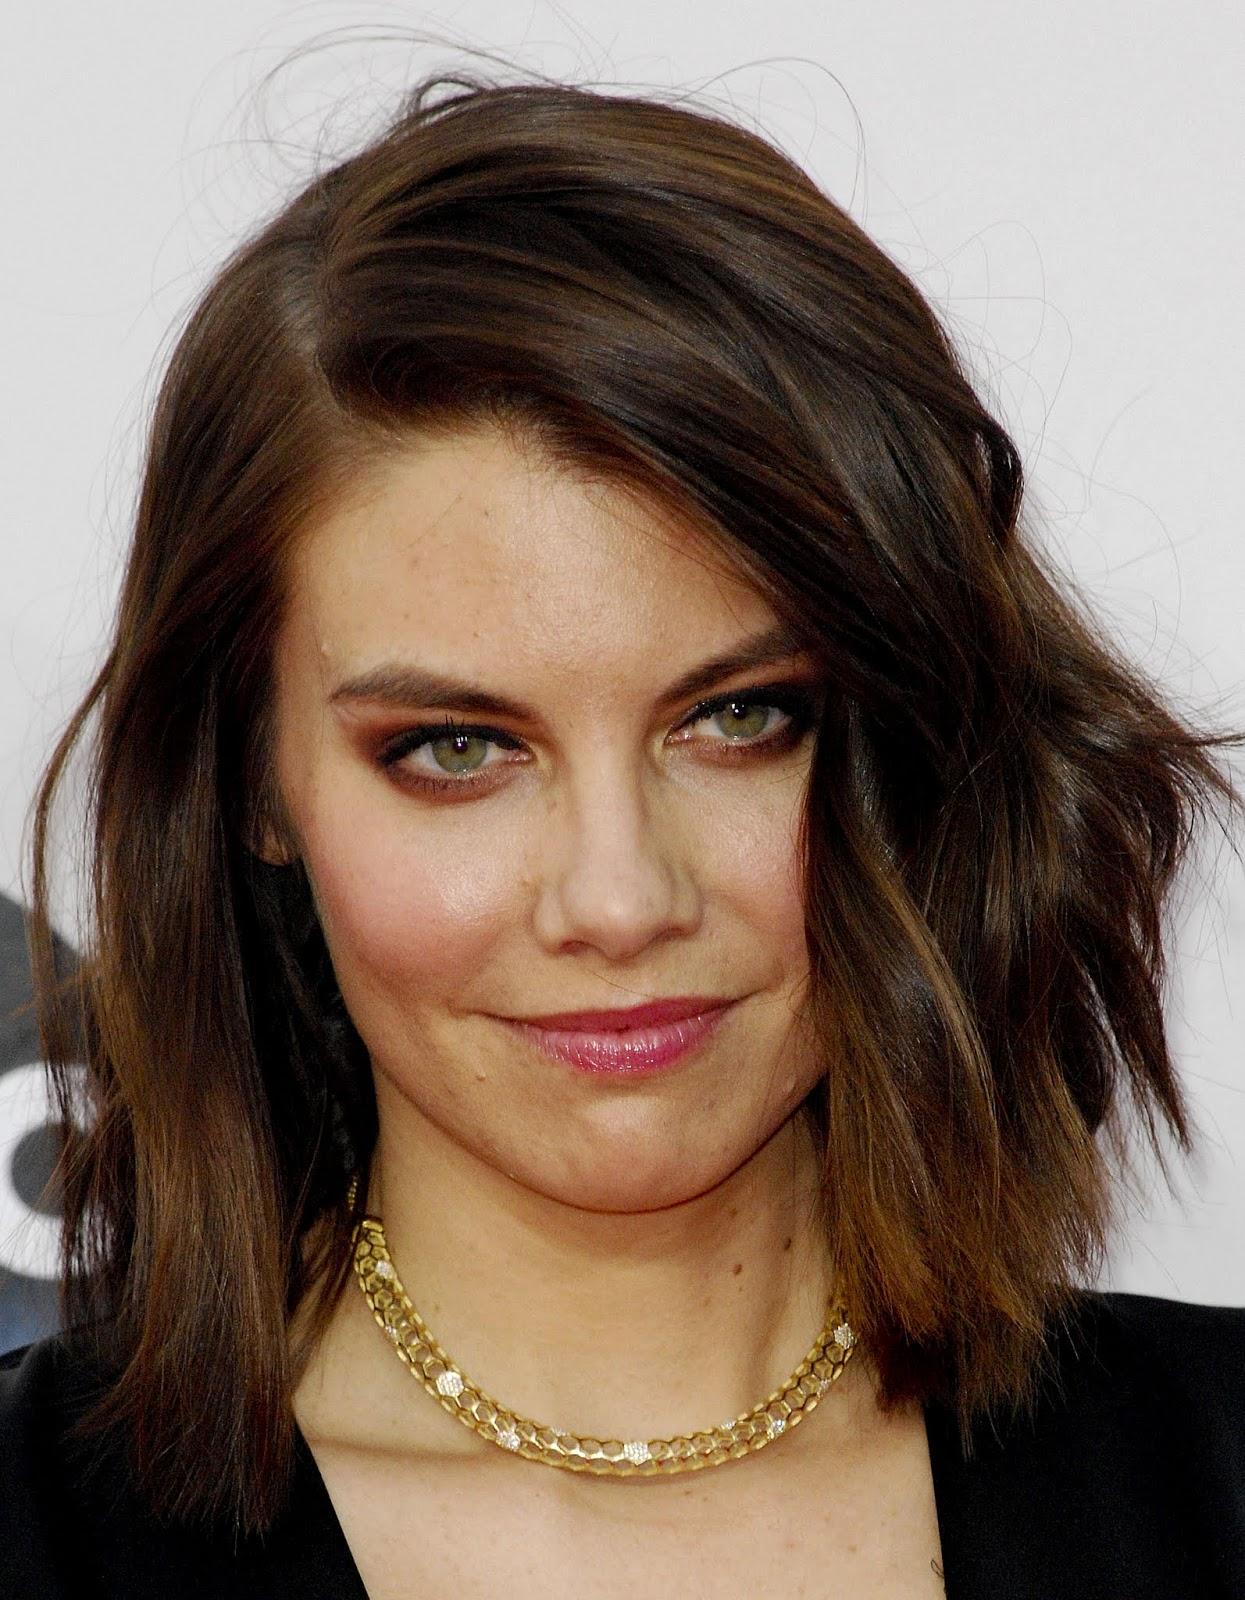 Lauren Cohan American Music Awards La 007 Kristen Stewart Set Charlie Angels